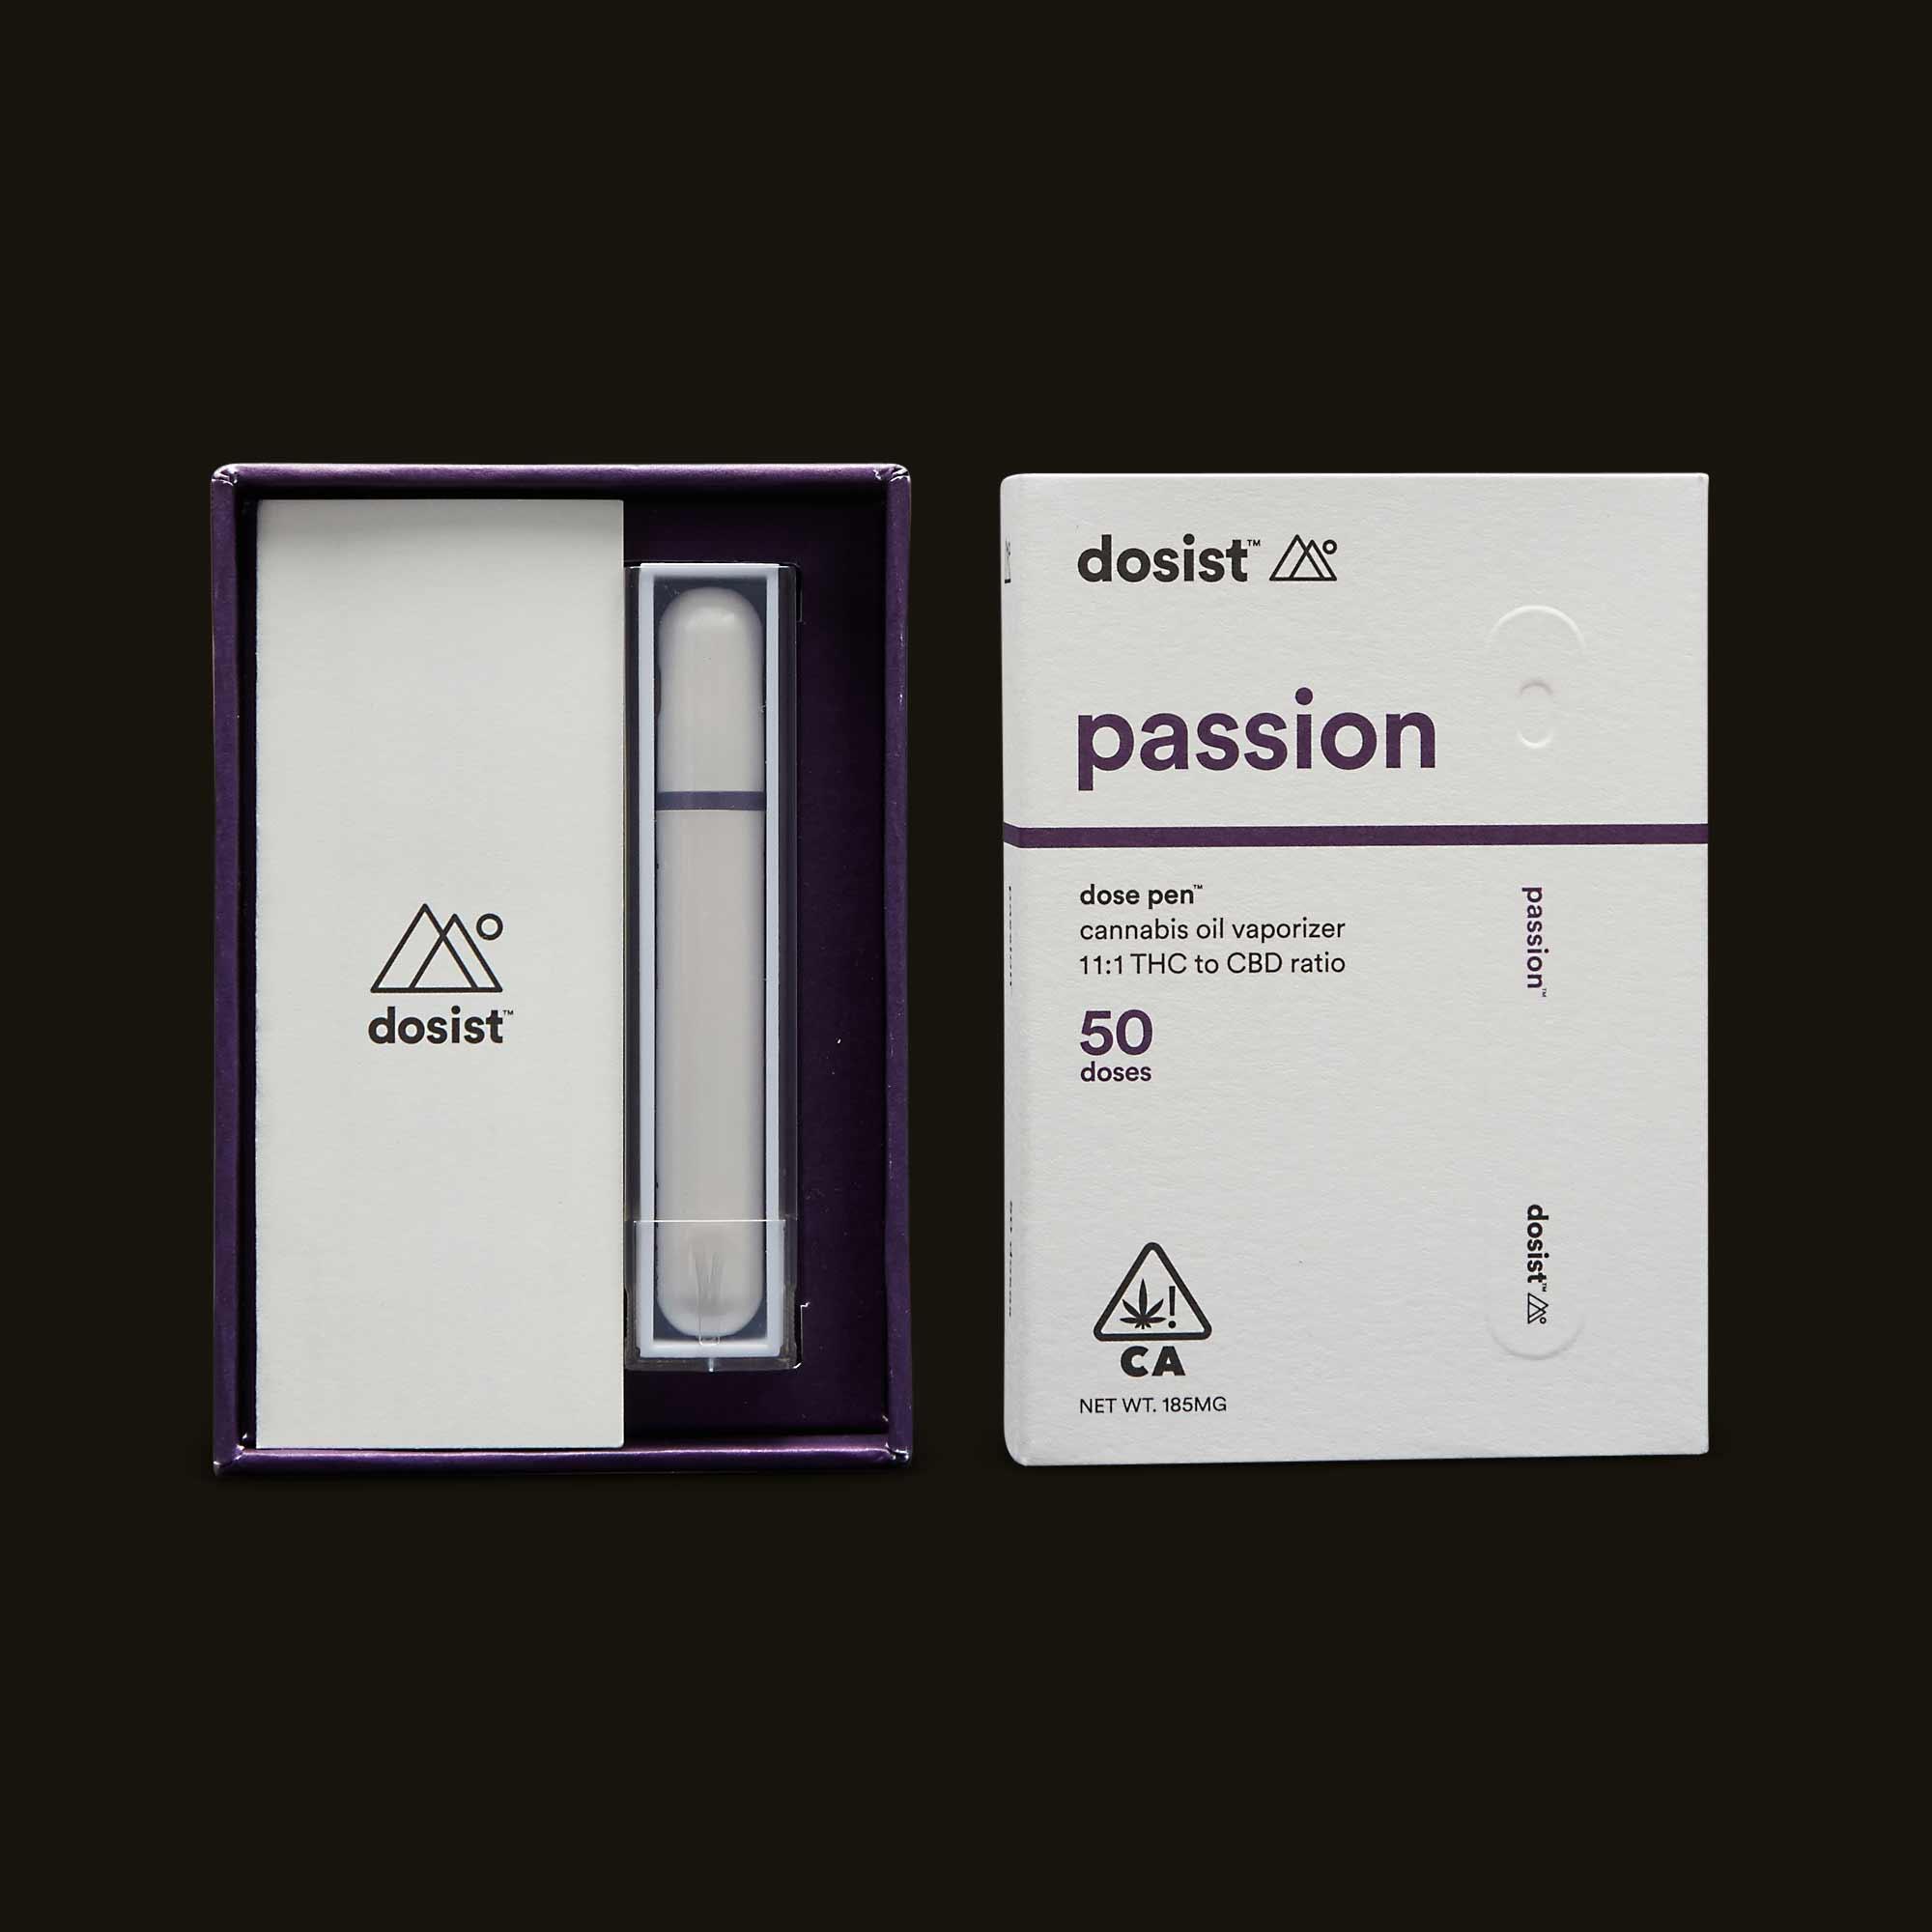 sex vape pen dosist in packaging